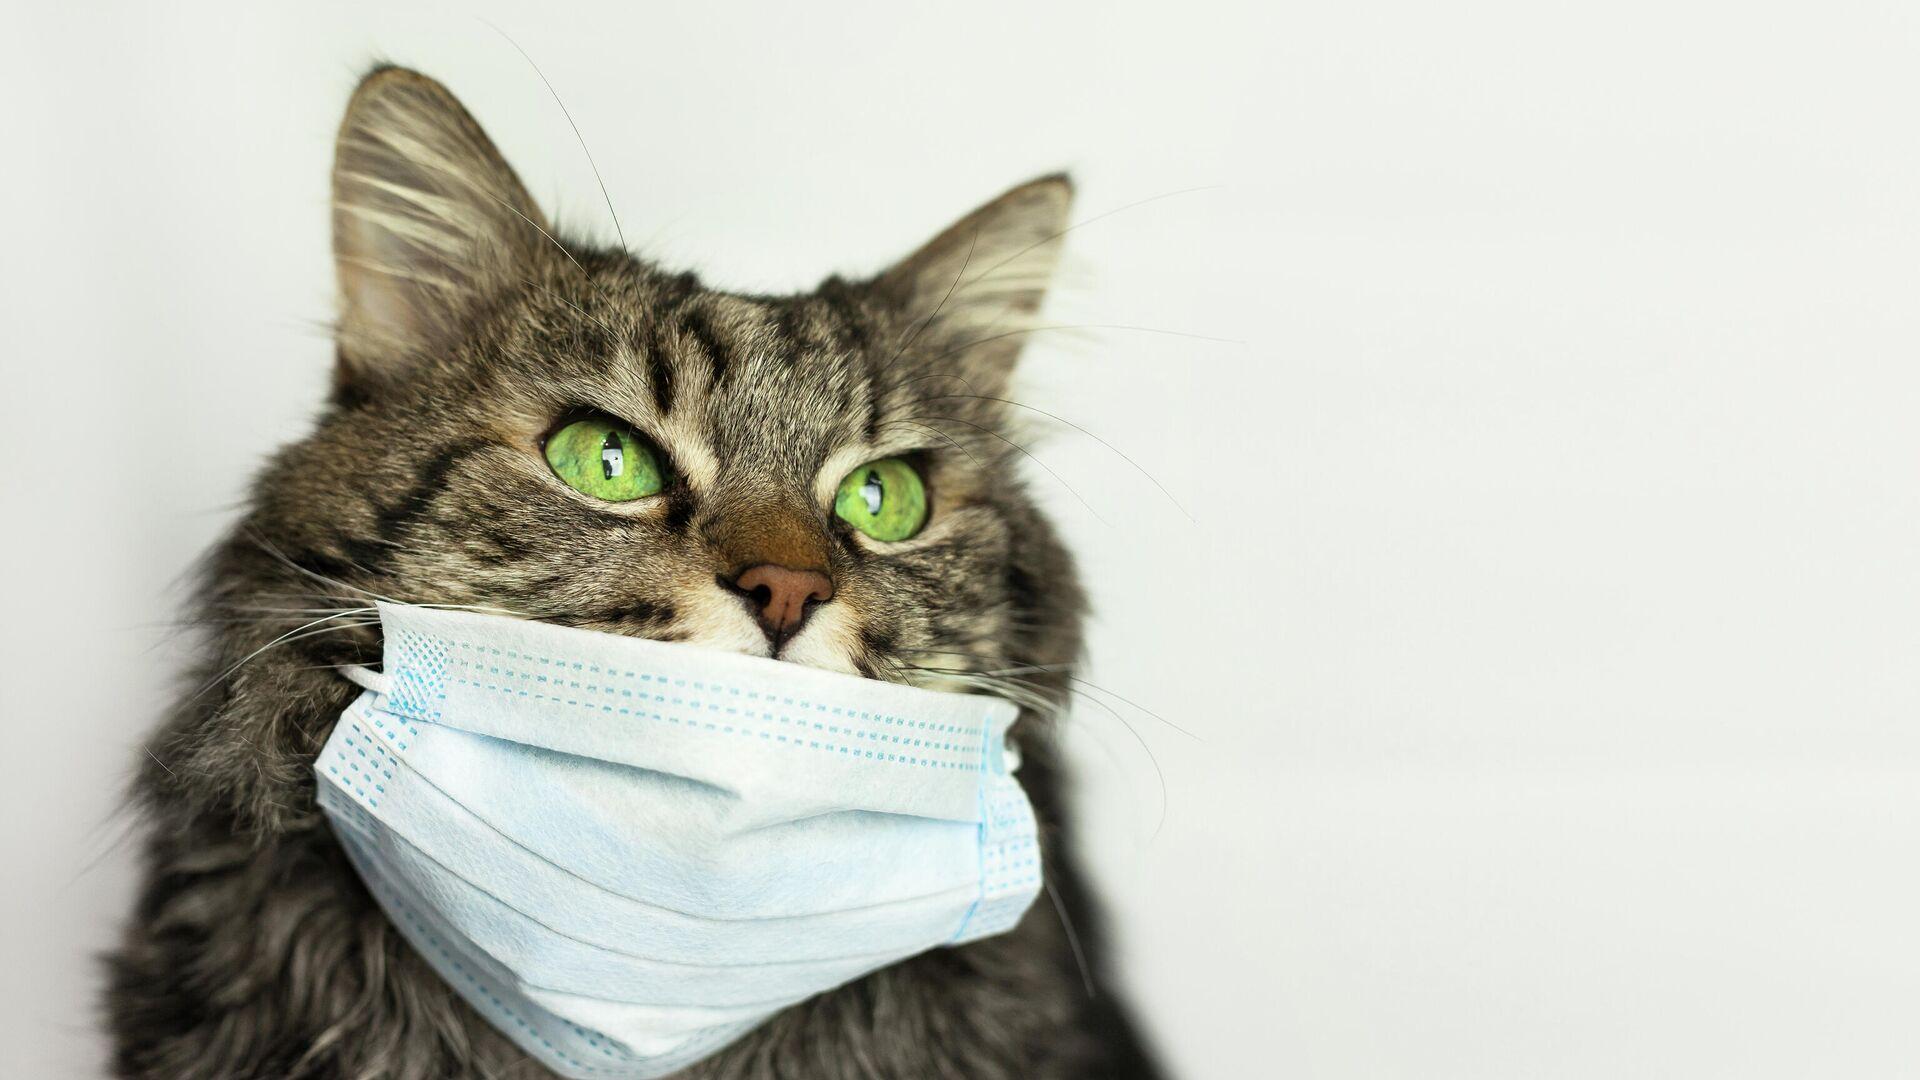 Кошка в маске - РИА Новости, 1920, 05.04.2021